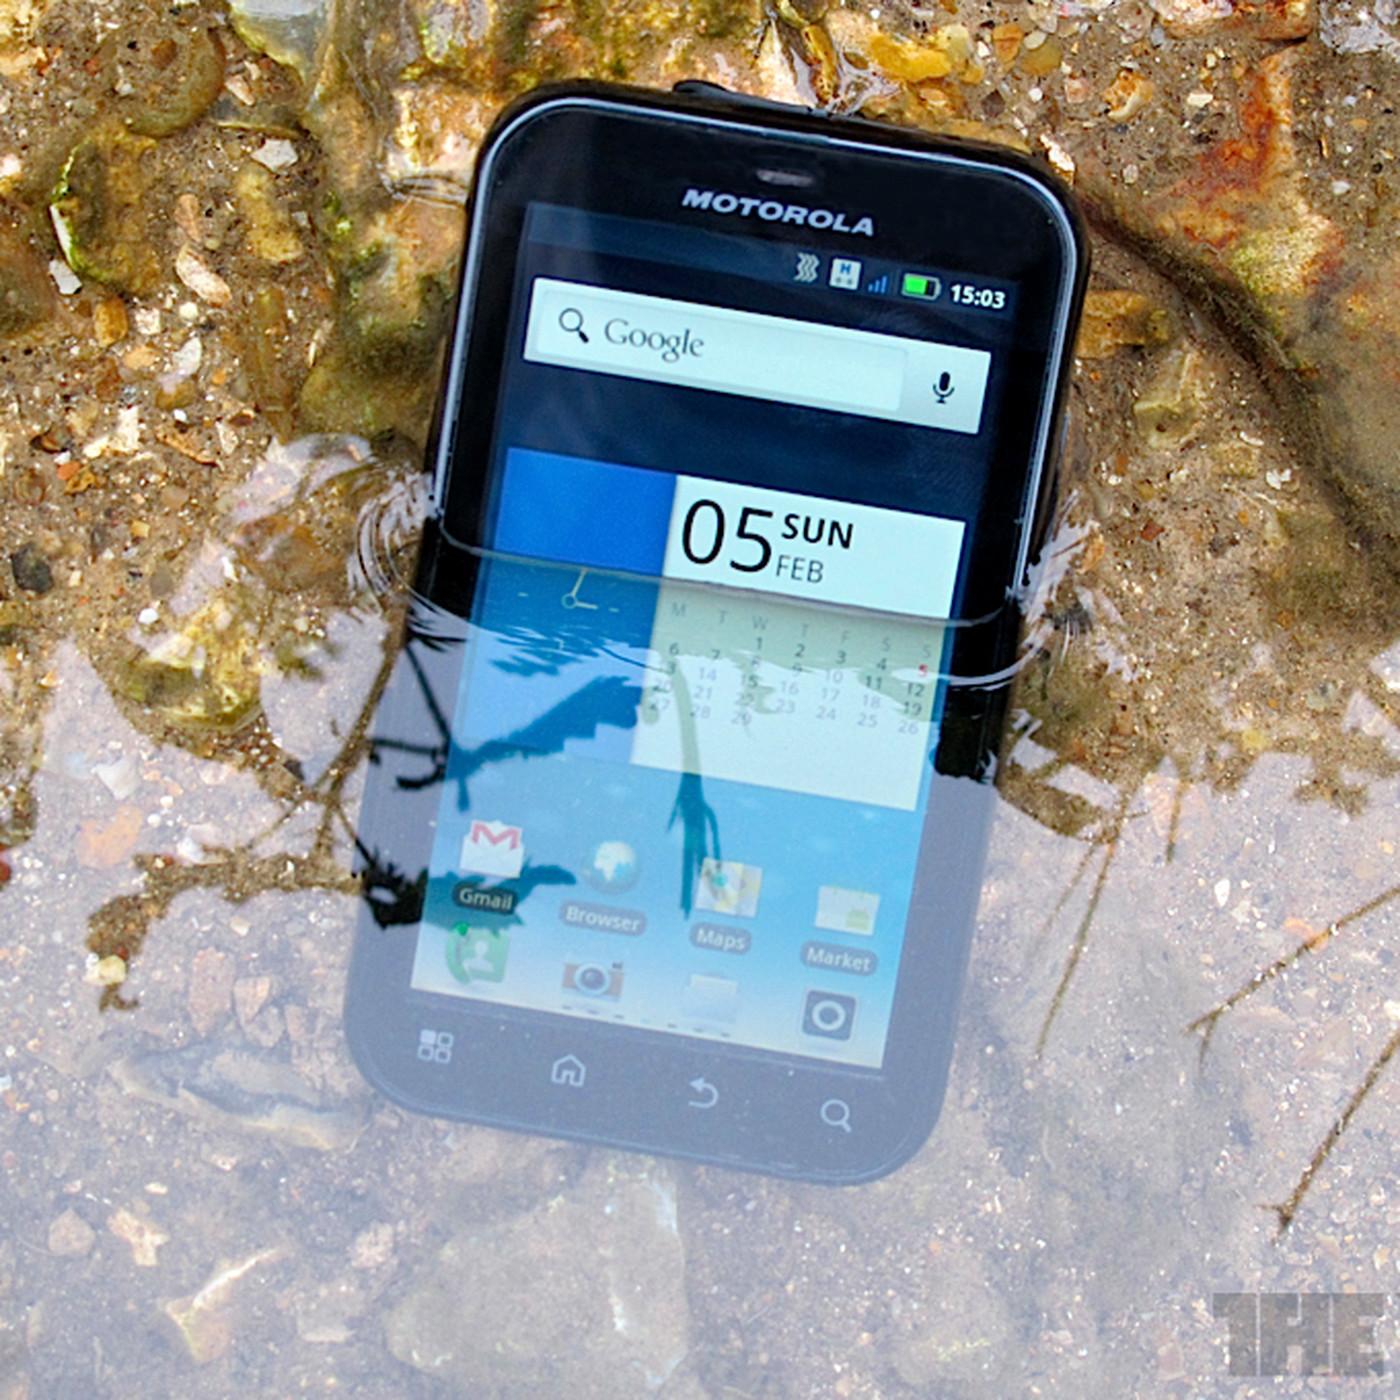 Motorola Defy+ review - The Verge